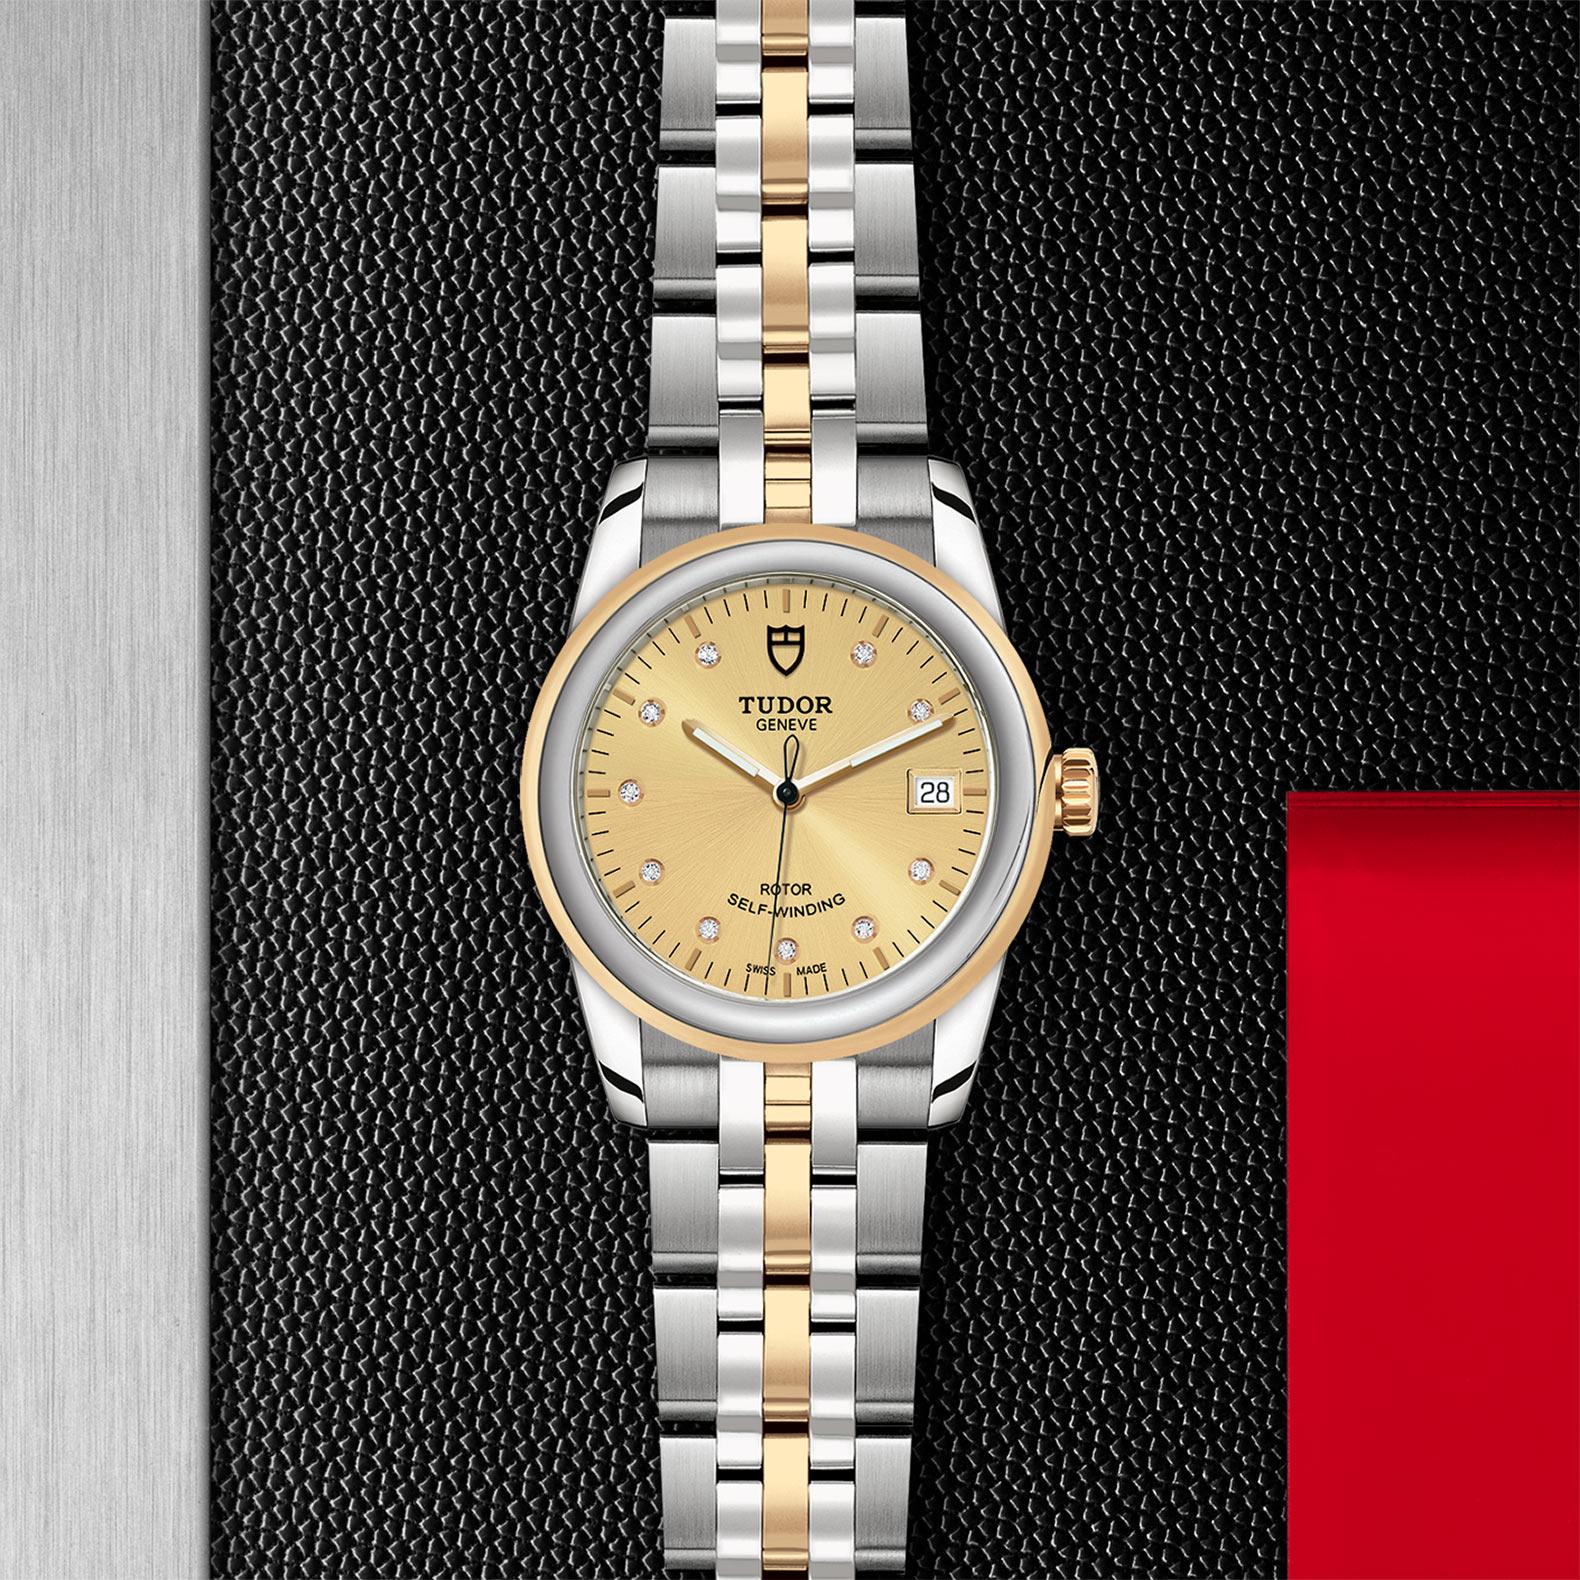 TUDOR Glamour Date - M55003-0006